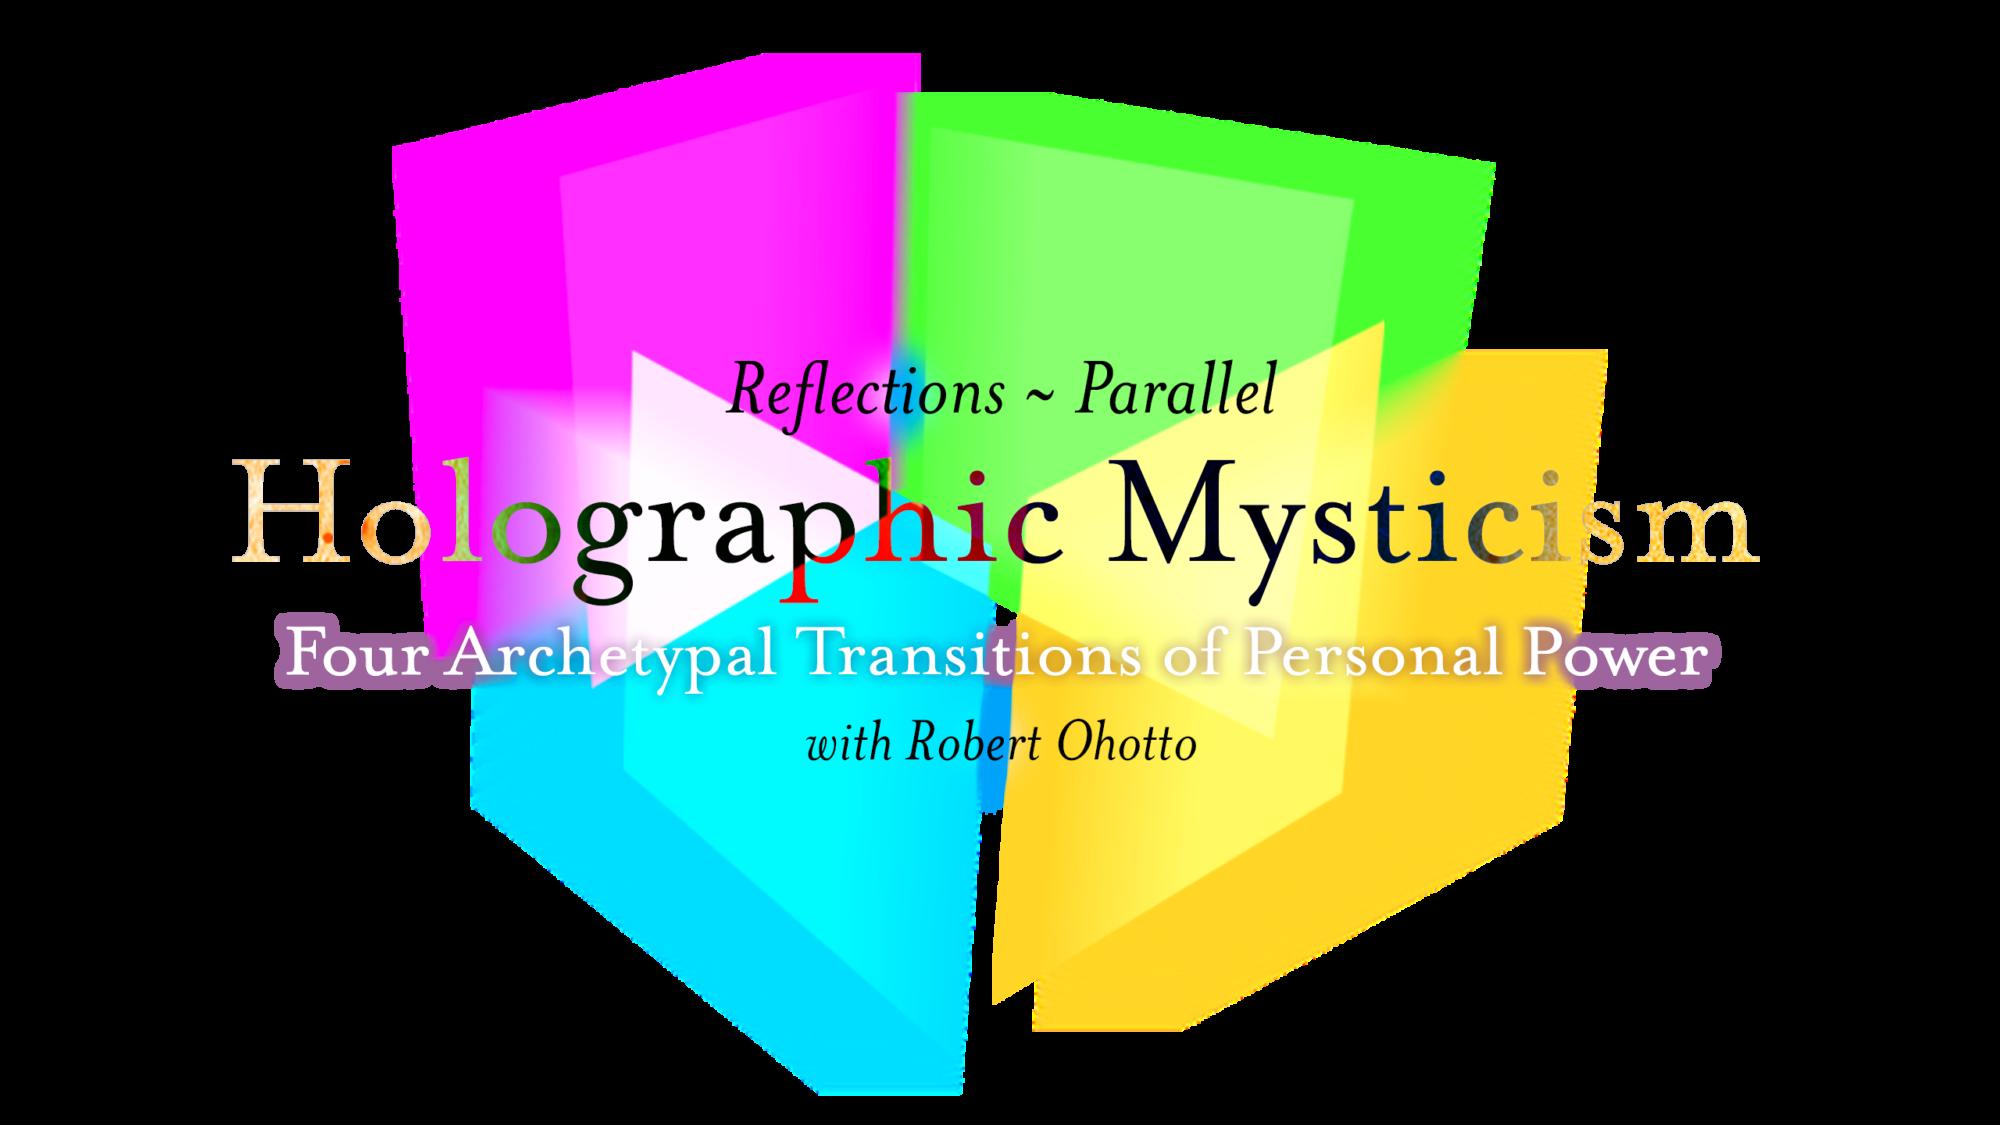 Holographic Mysticism